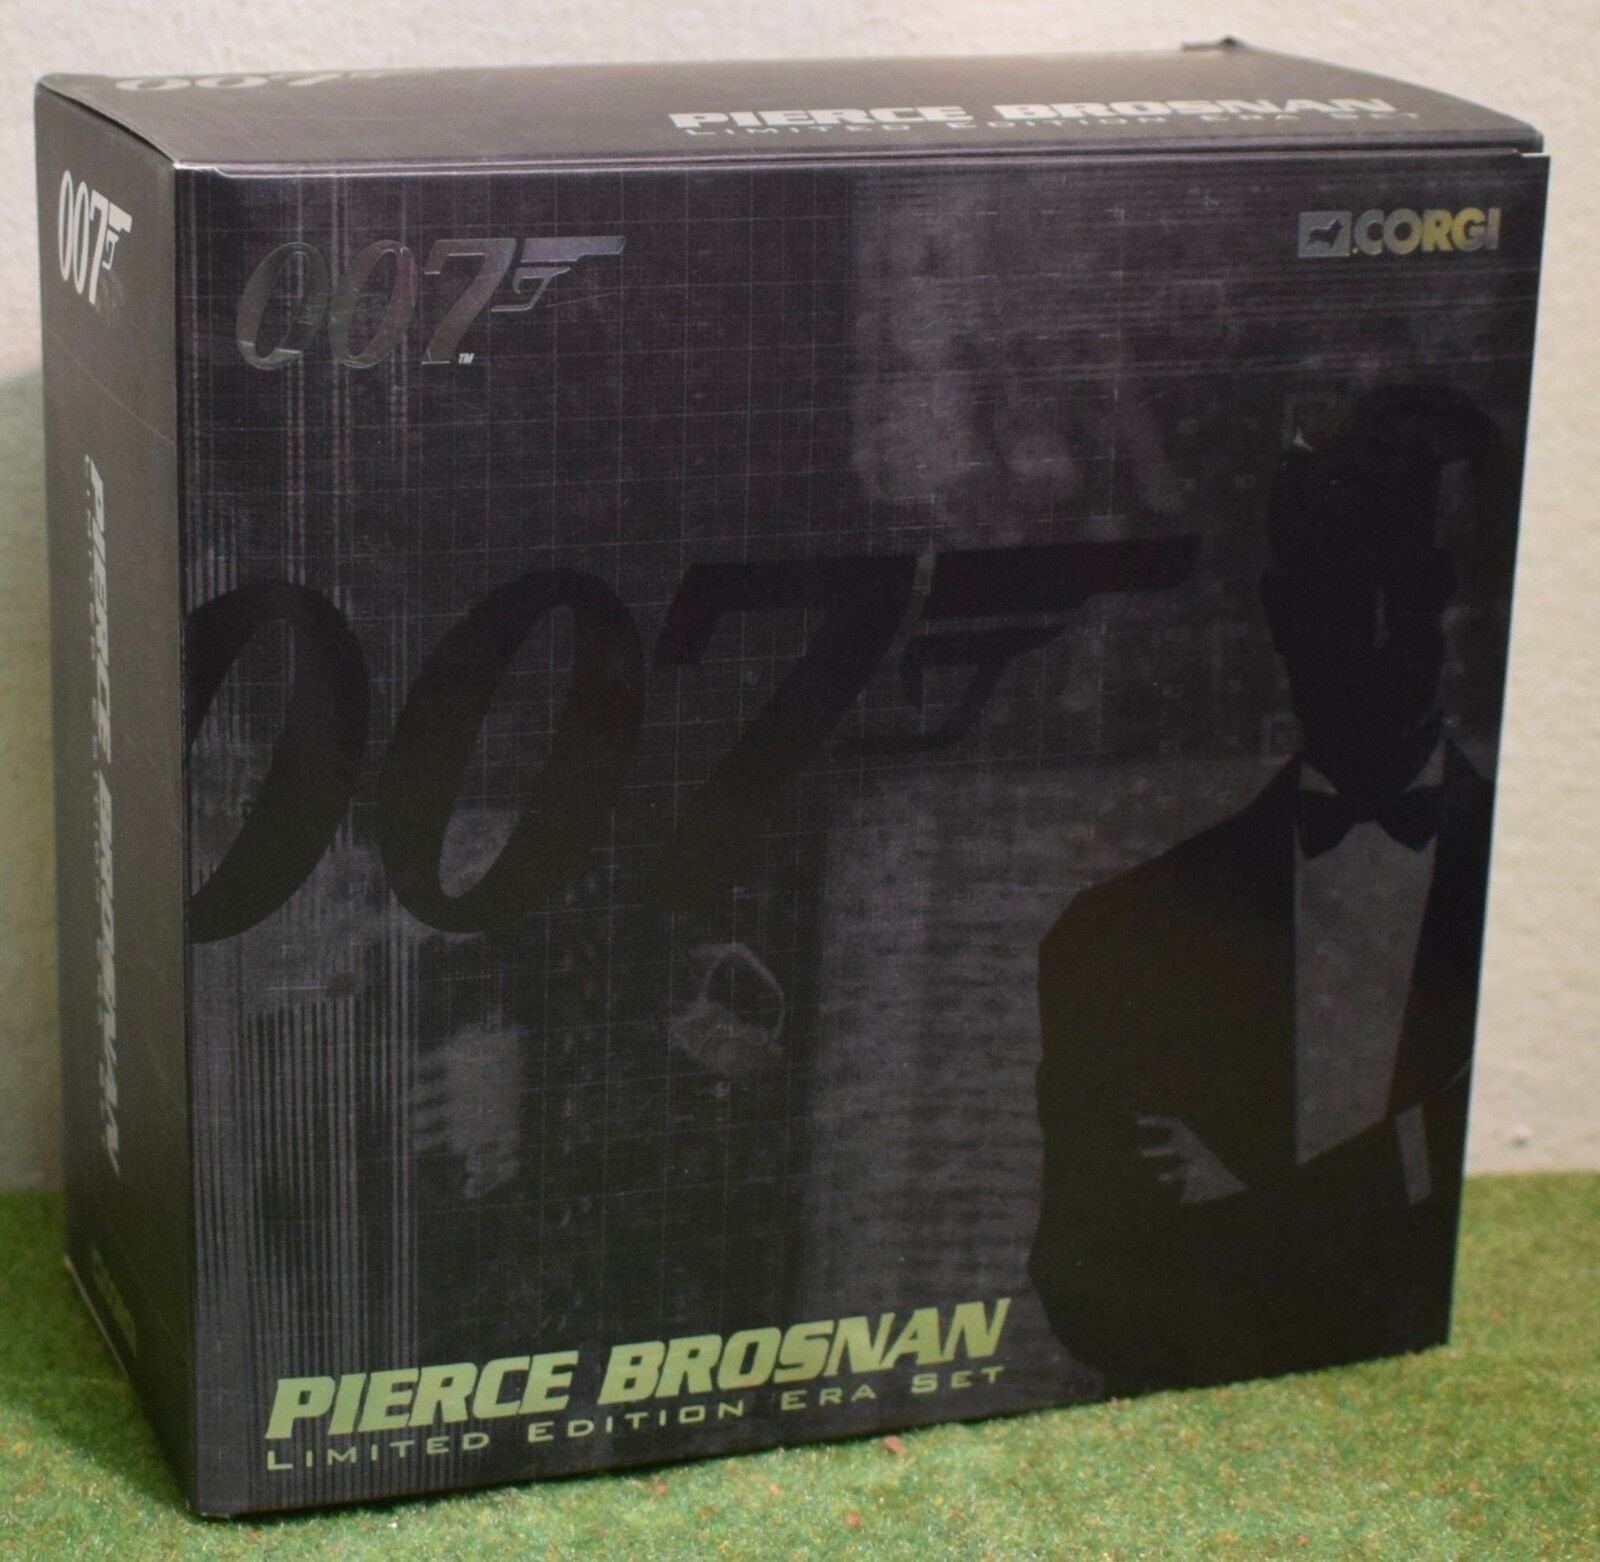 Corgi James Bond 007 Die Cast Limited Edition Era Set Pierce Brosnan CC93992